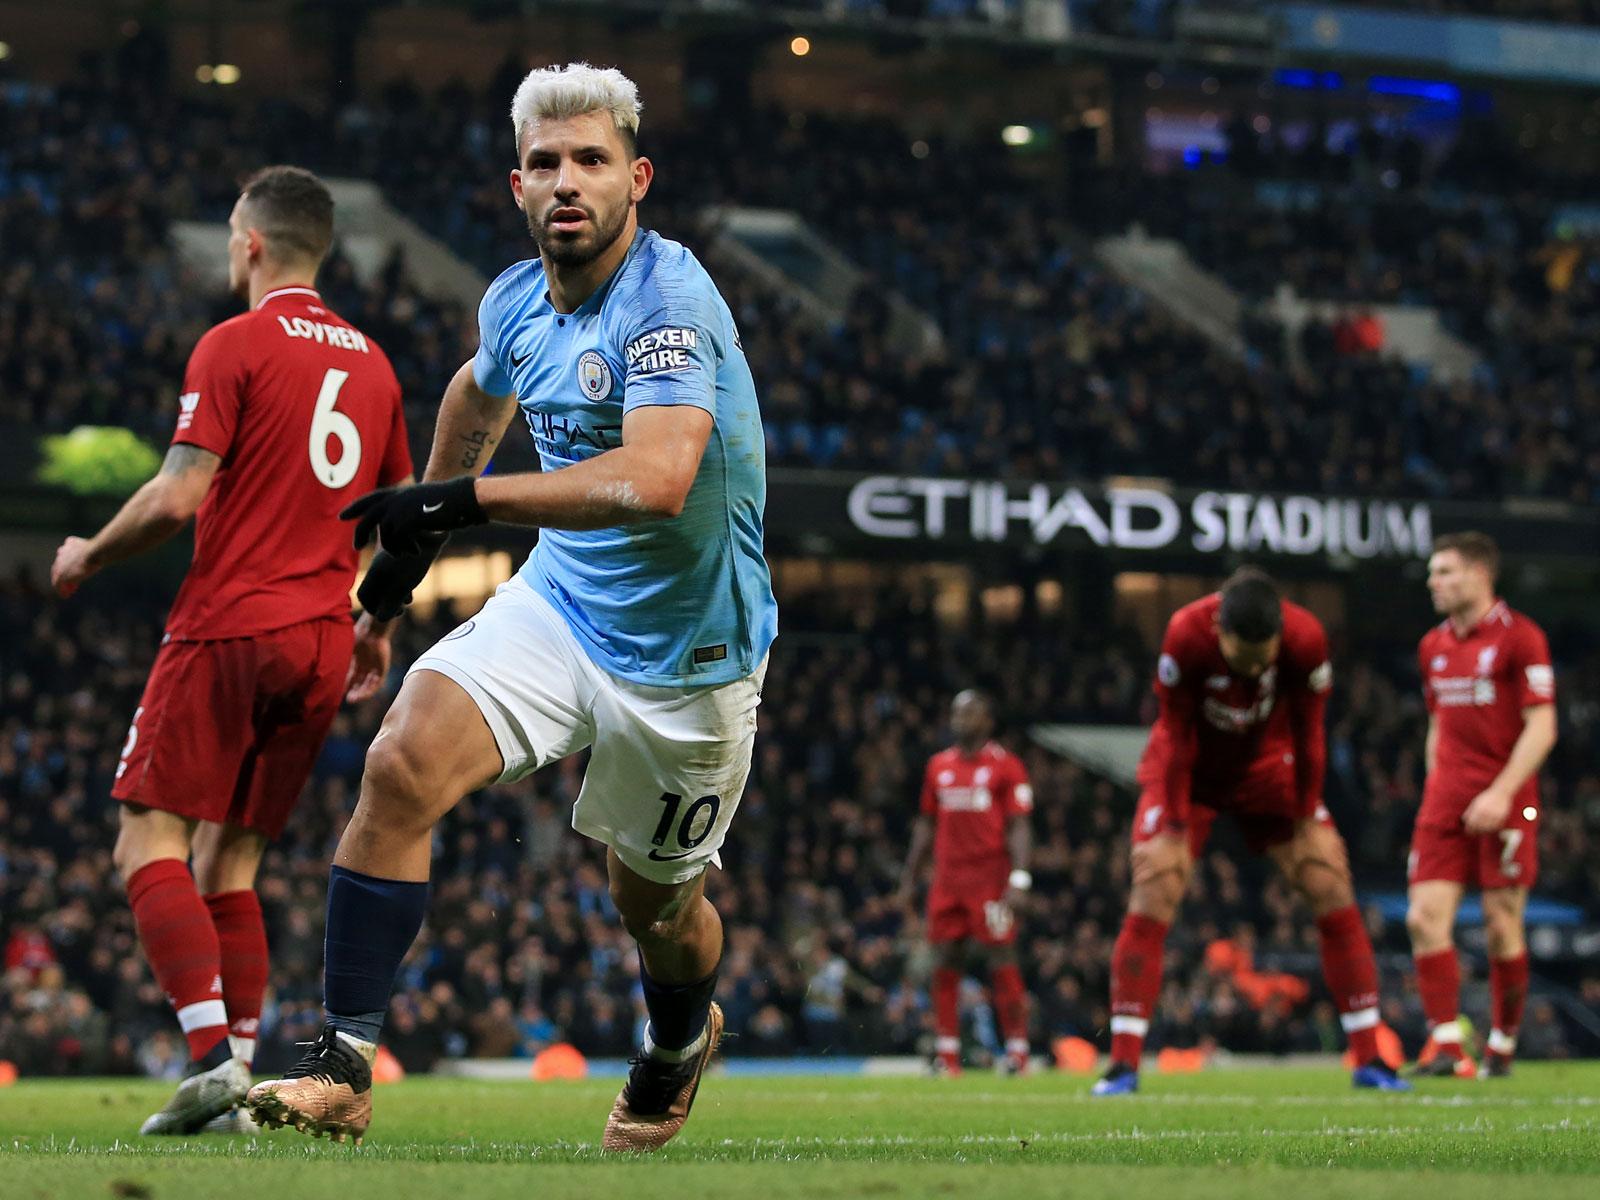 Sergio Aguero scores for Man City vs. Liverpool